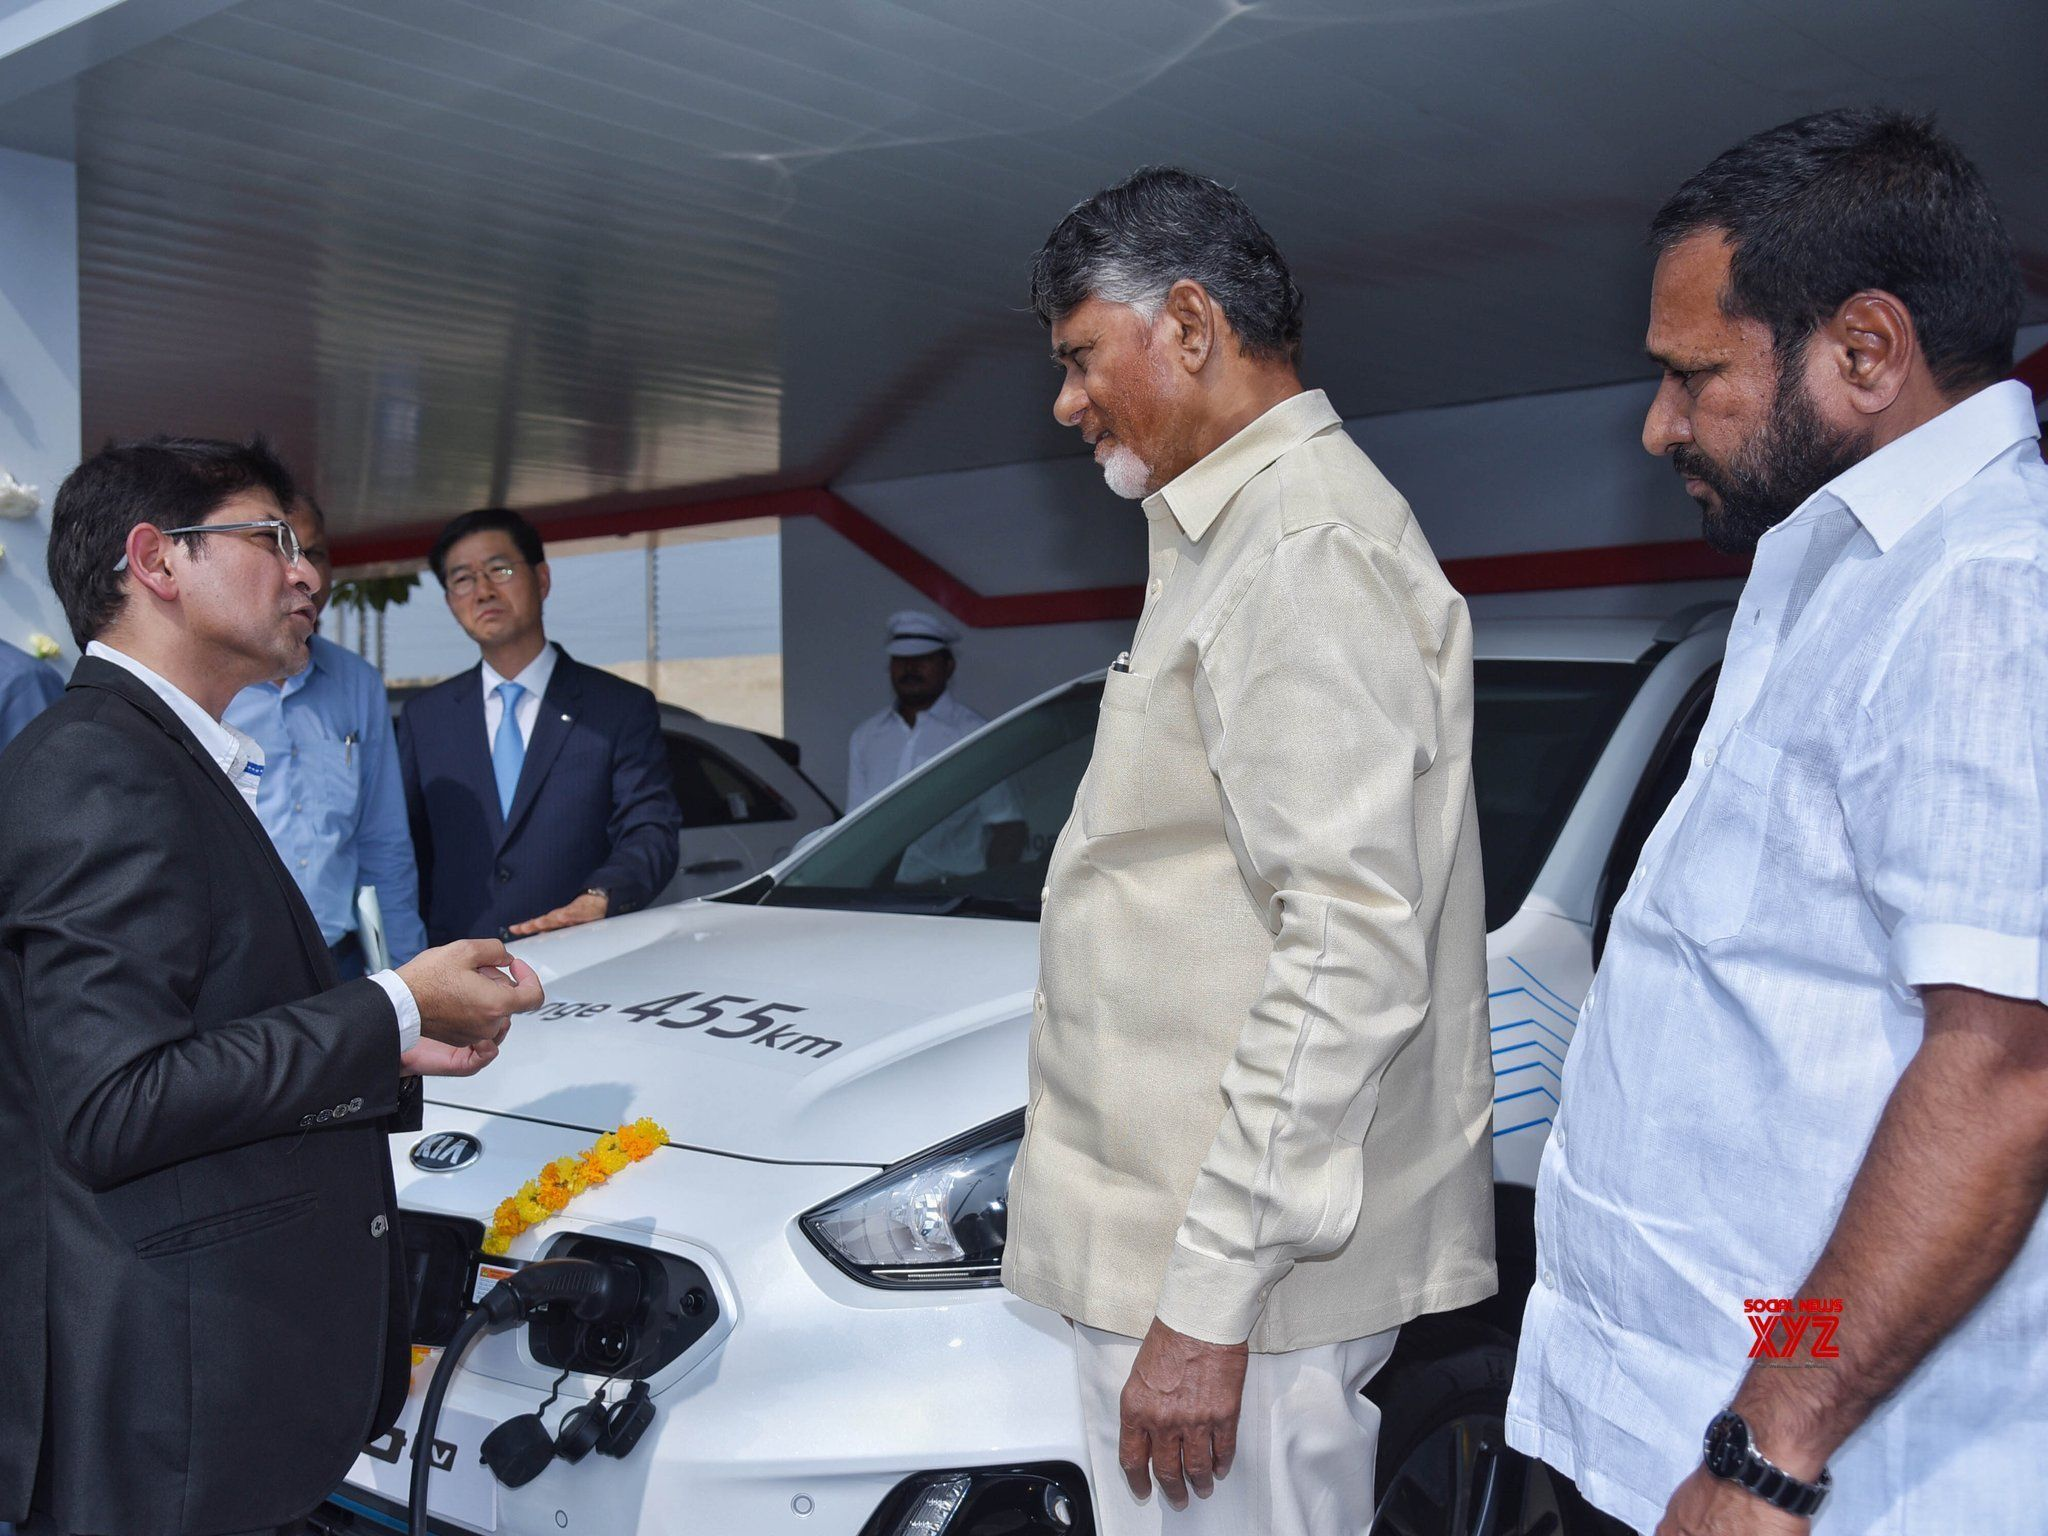 Kia Motors Signs MoU With Andhra CM Chandrababu Naidu For